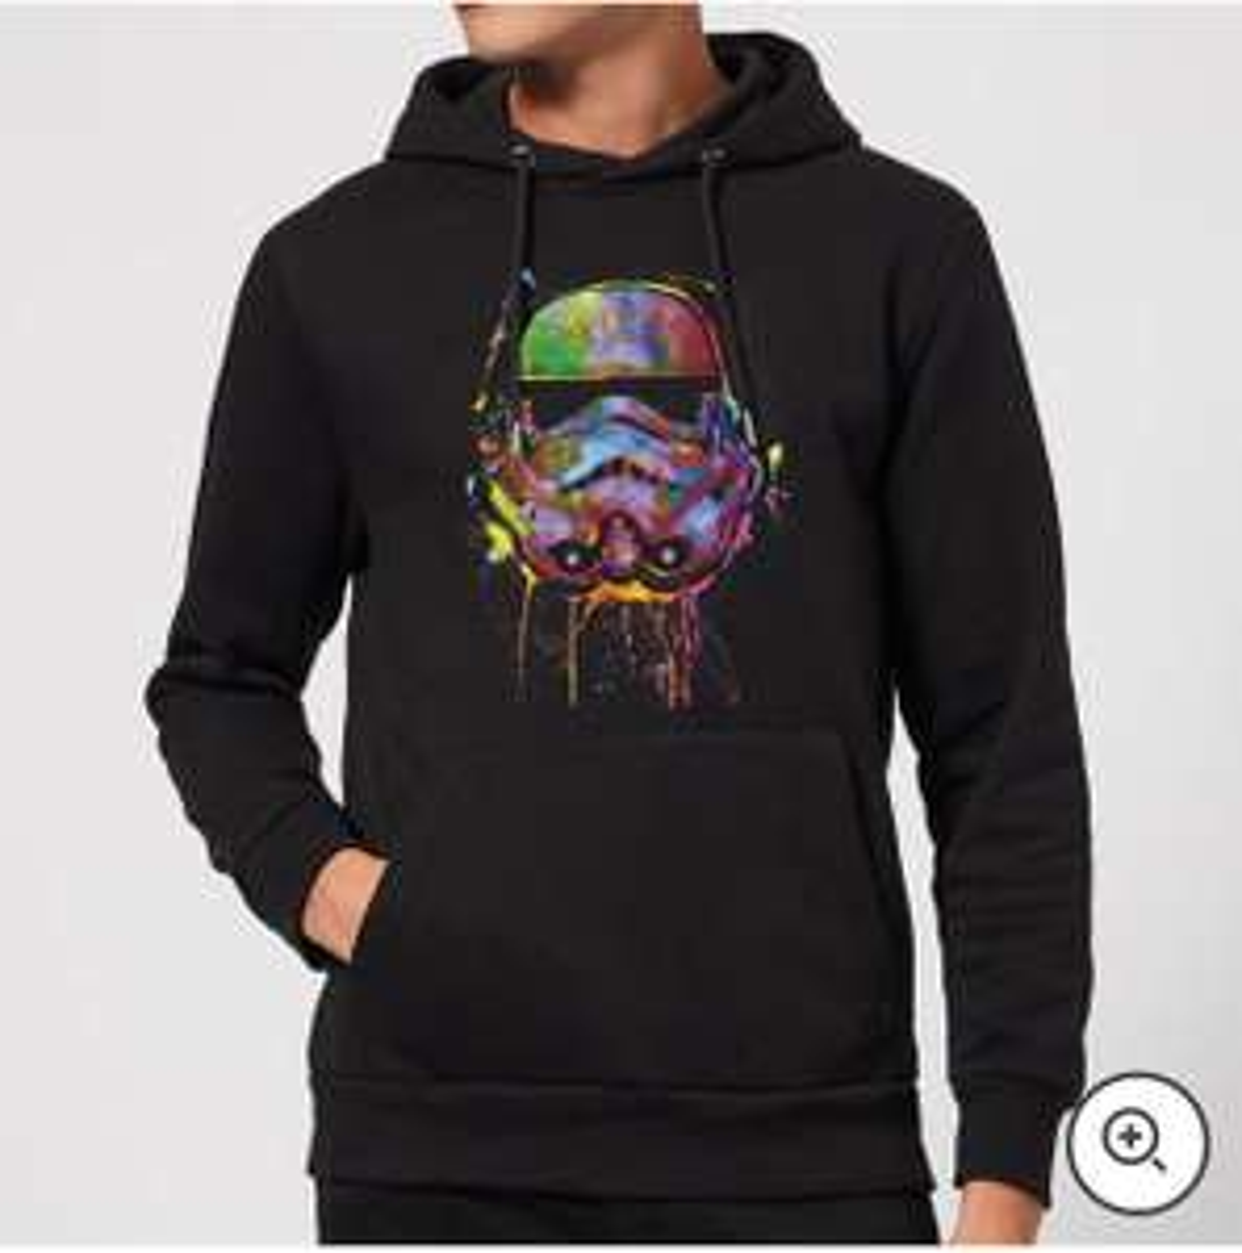 Star Wars Paint Splat Stormtrooper Pullover Hoodie - Black - £14.99 (+£1.99 Delivery) @ Zavvi